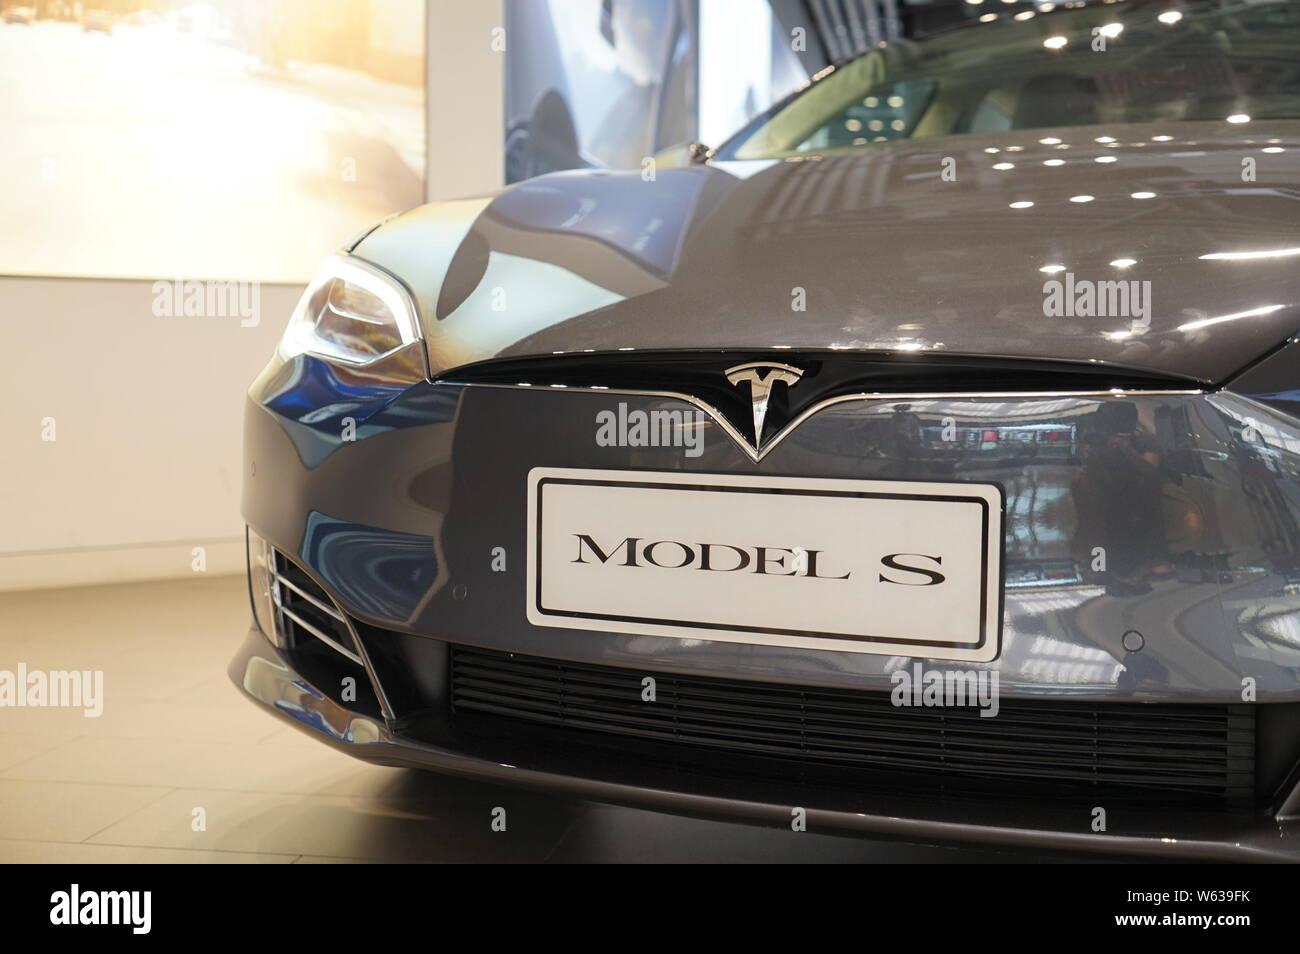 Tesla Unit Stock Photos & Tesla Unit Stock Images - Alamy